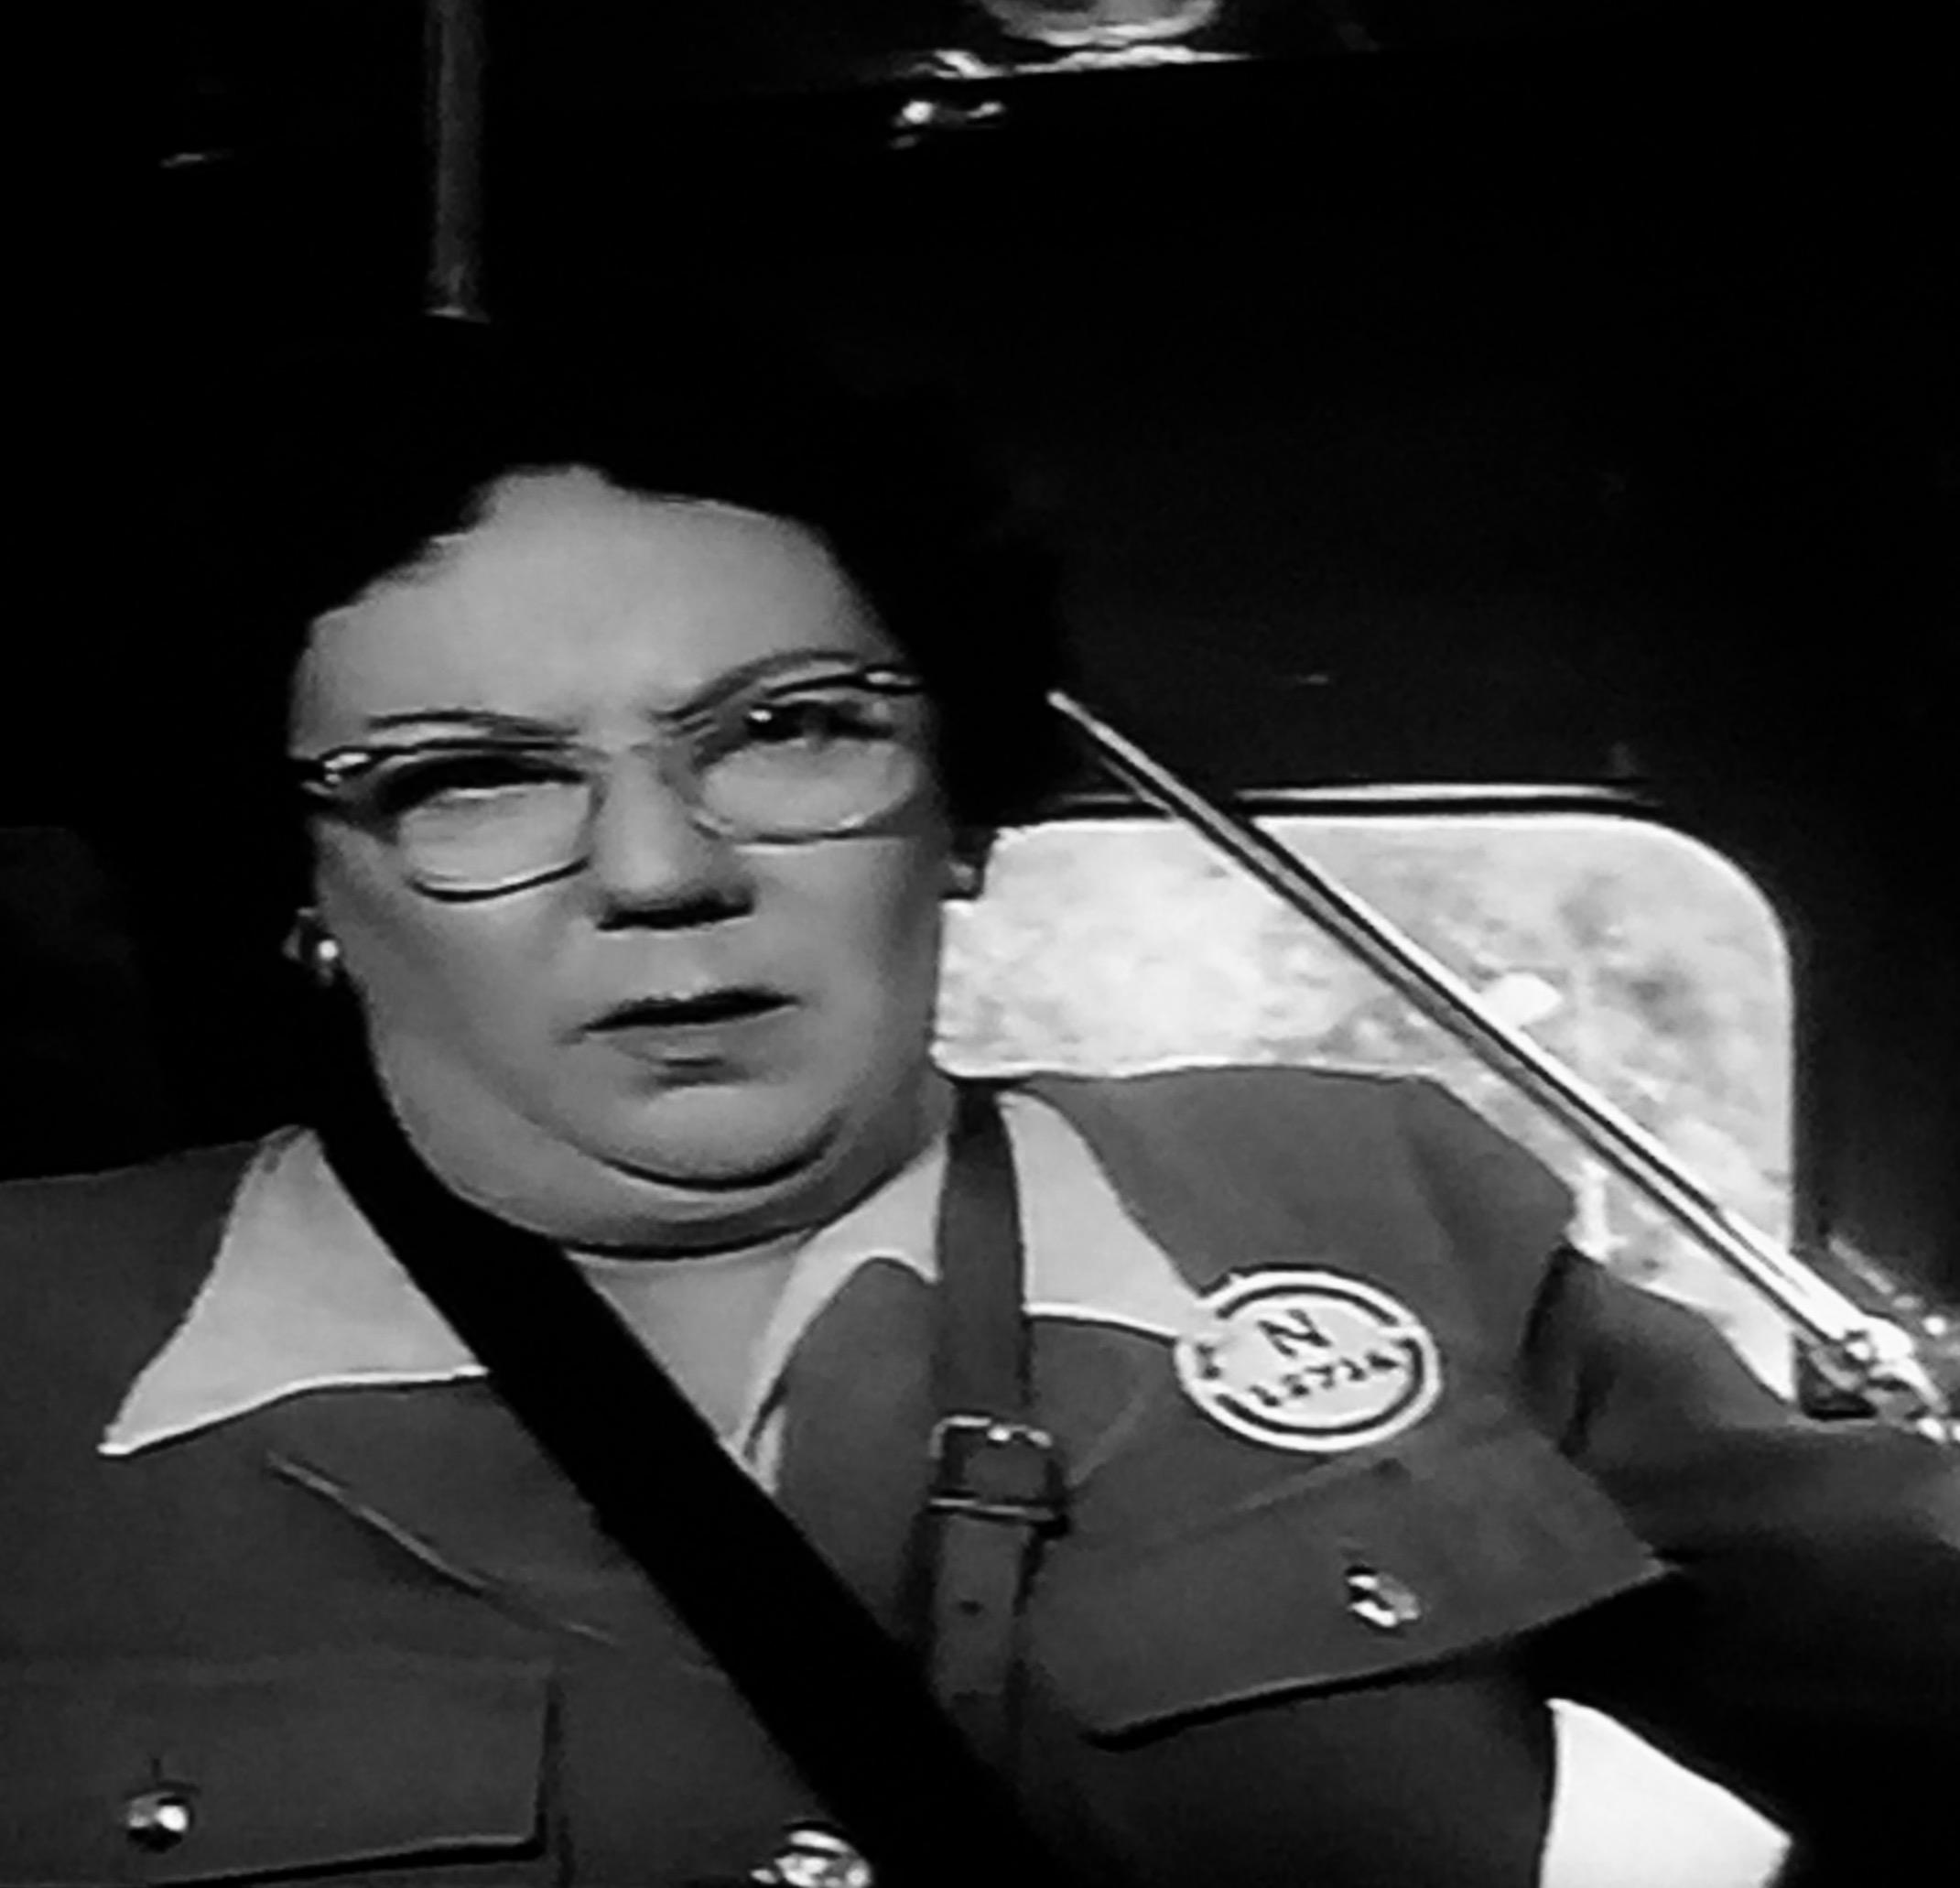 Dandy Nichols in Don't Talk to Strange Men (1962)